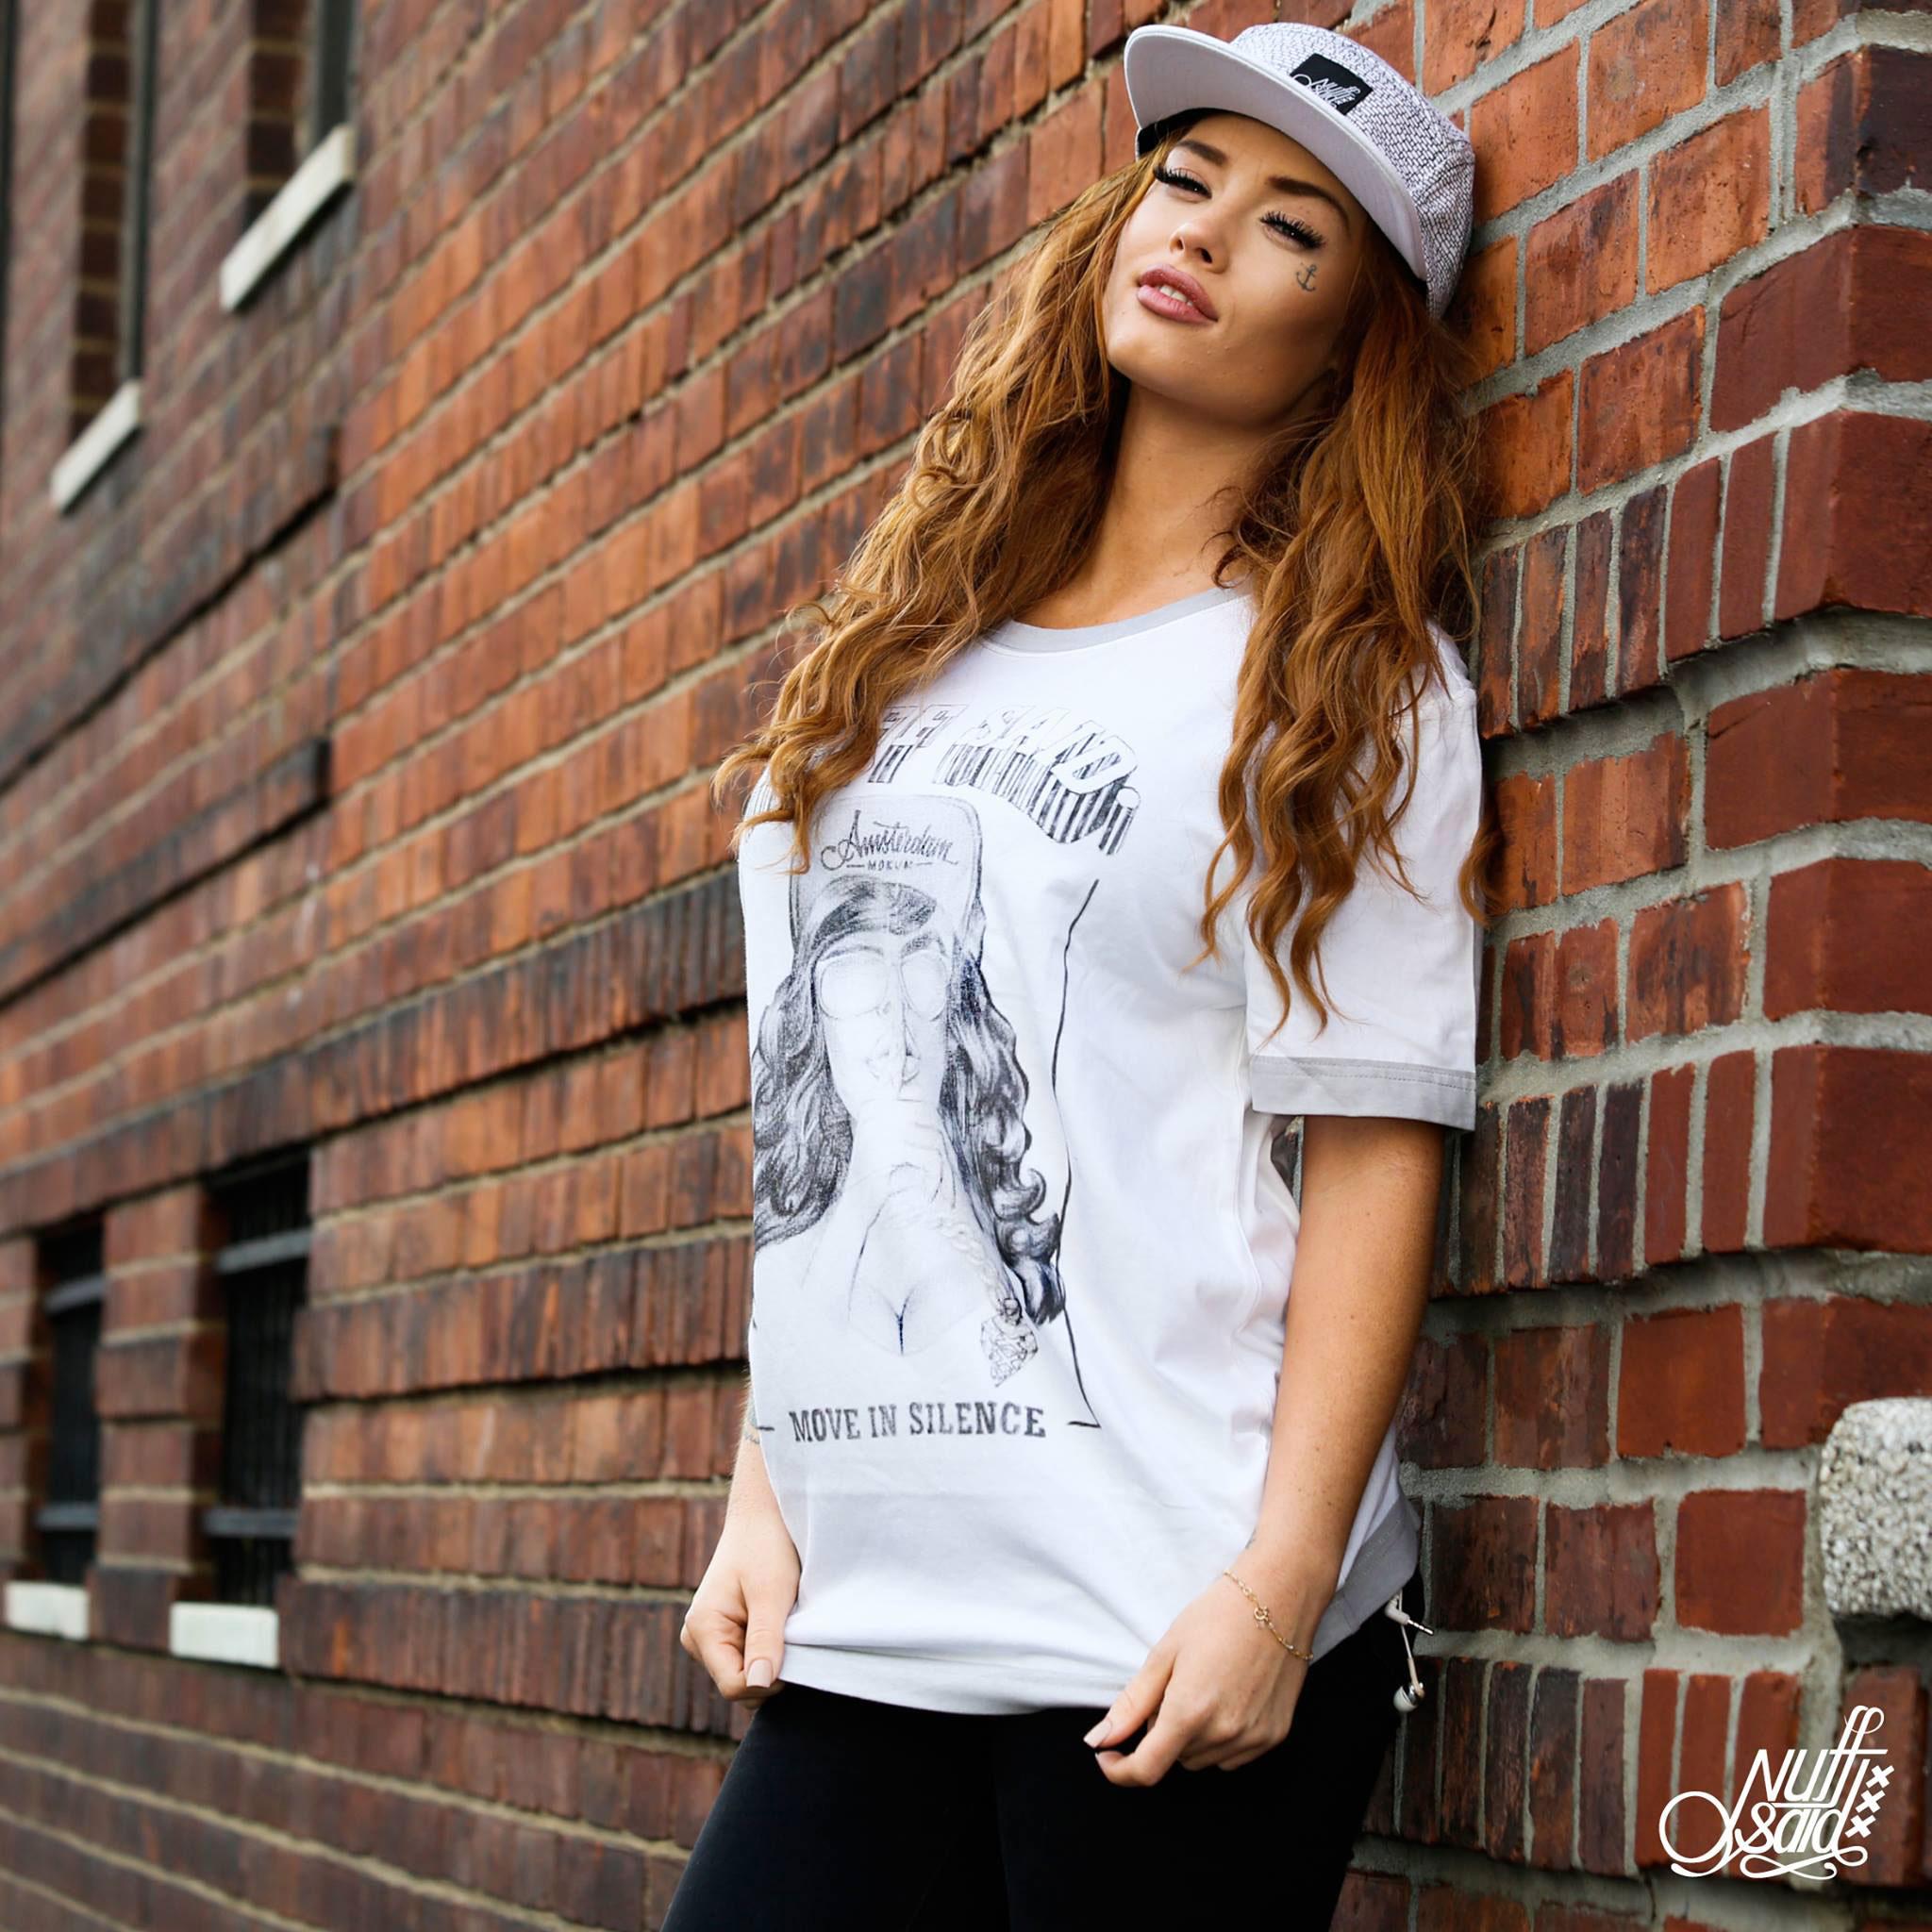 Nuff Said Amsterdam BatArtworks shirt